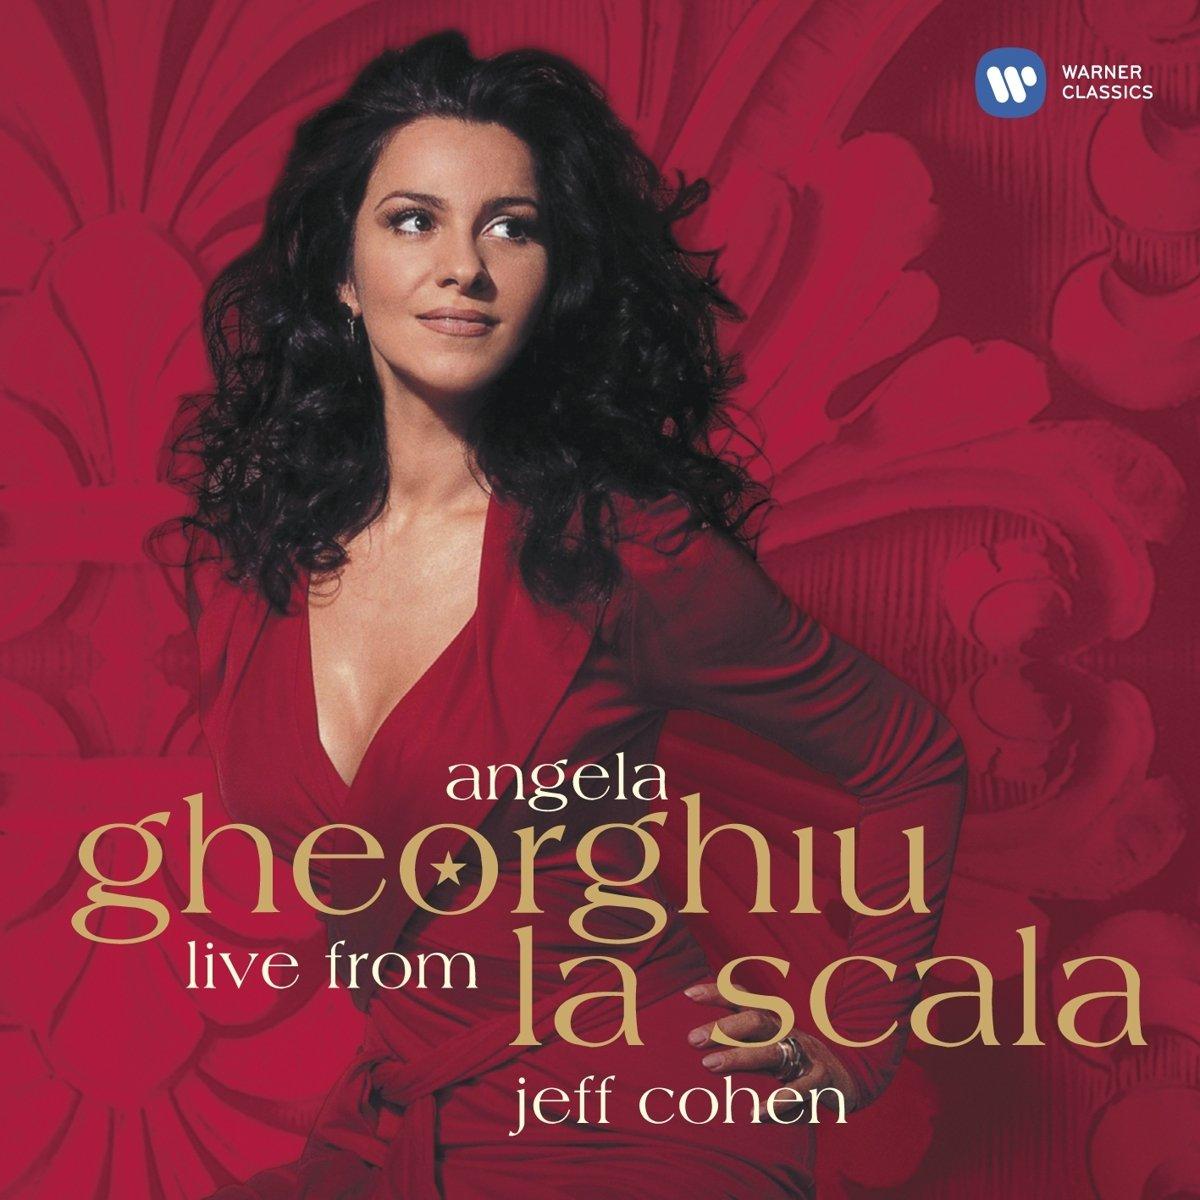 Angela Gheorghiu - Live from La Scala by Warner Classics